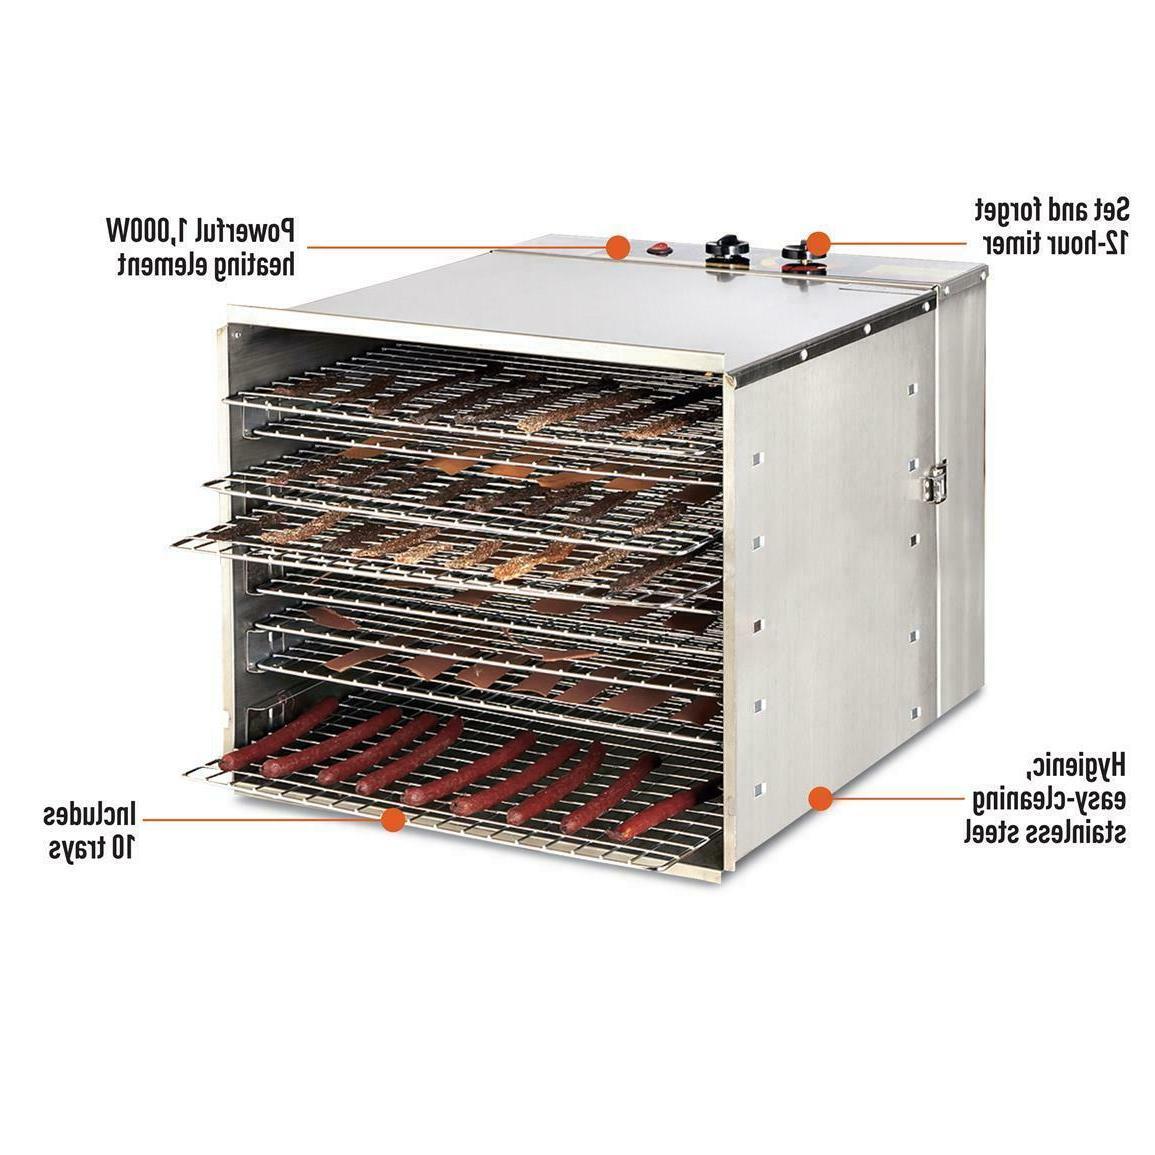 Food Dehydrator 10 Stainless Steel Jerky Meat Dryer Commercial